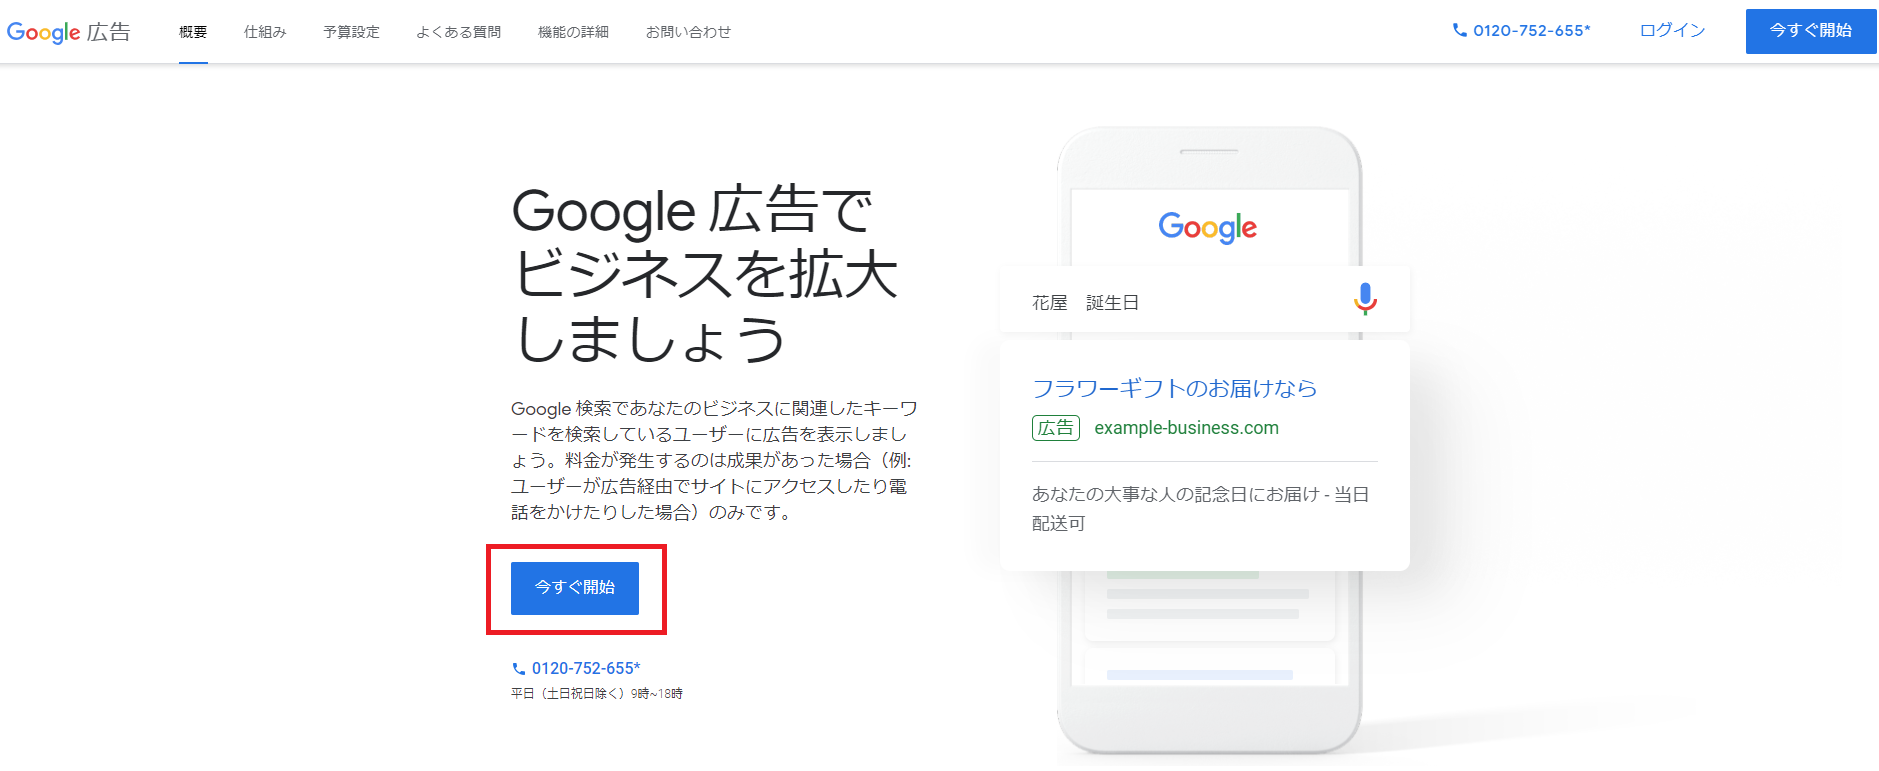 Google広告 アカウント 作成-2